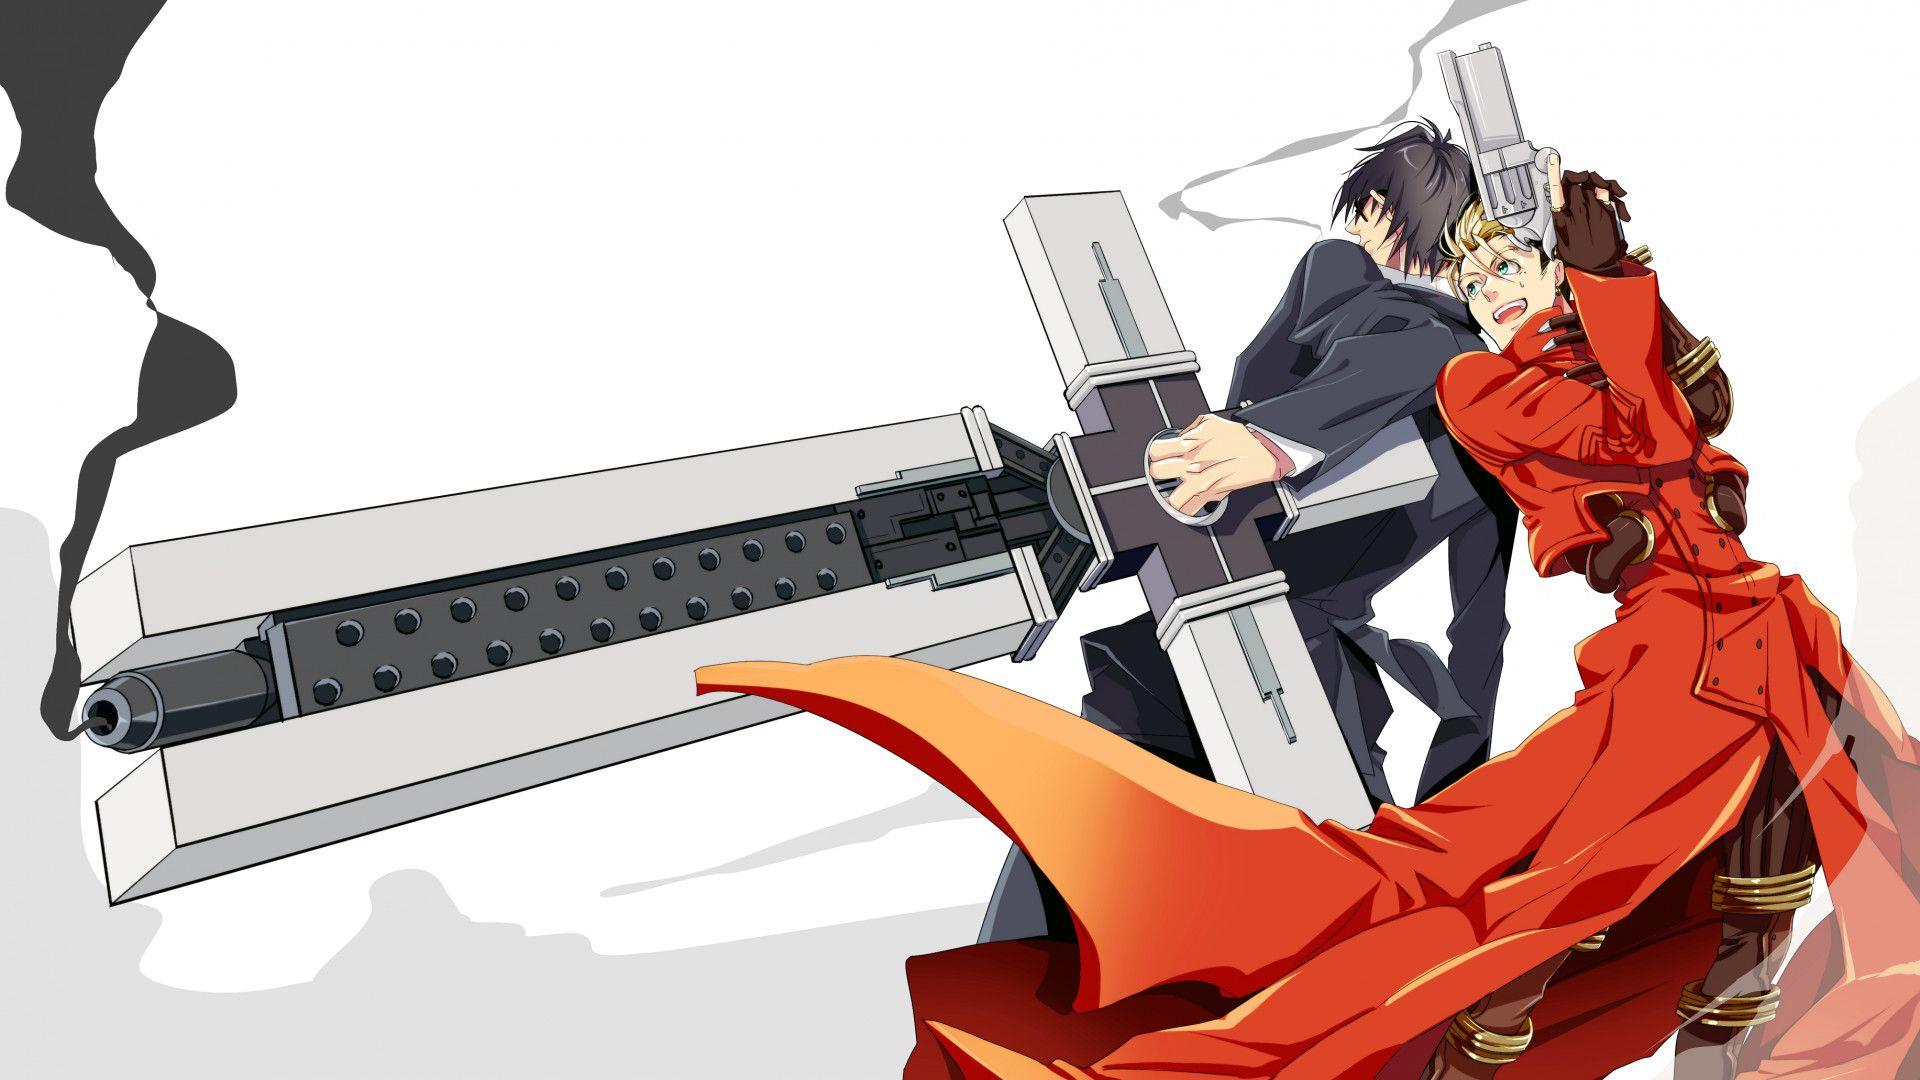 Res 1920x1080 Vash The Stampede Nicholas D Wolfwood Trigun Coat Trigun Wallpaper Anime